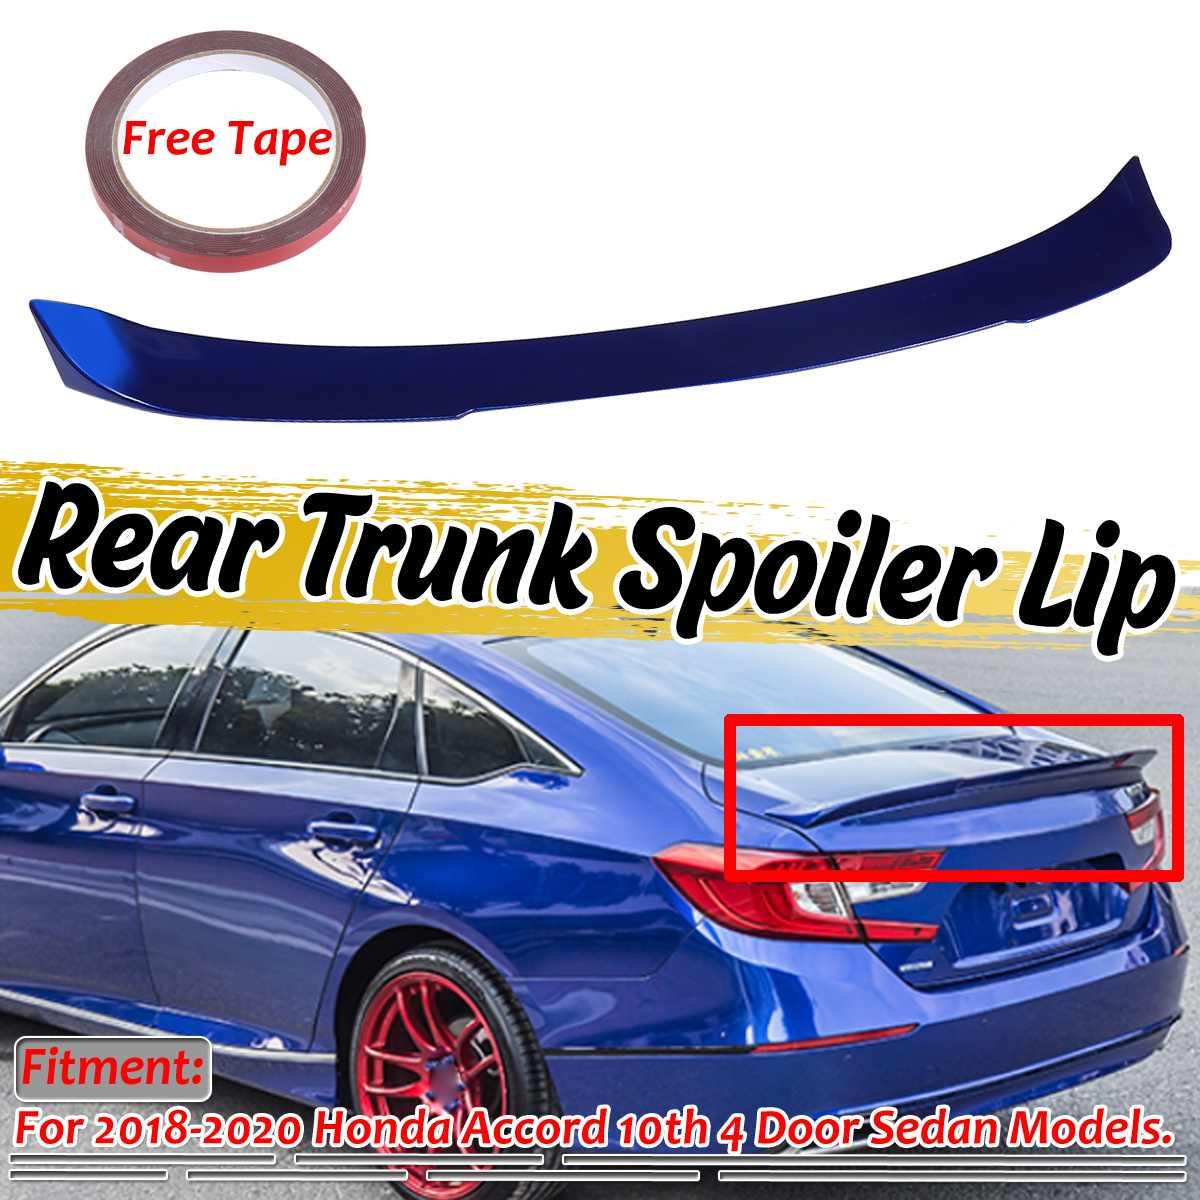 Gran calidad, alerón trasero para maletero de coche Duckbill, tapa grande ABS para Honda para Accord 10th 4Dr sedán 2018-2020 Blanco/Negro/azul